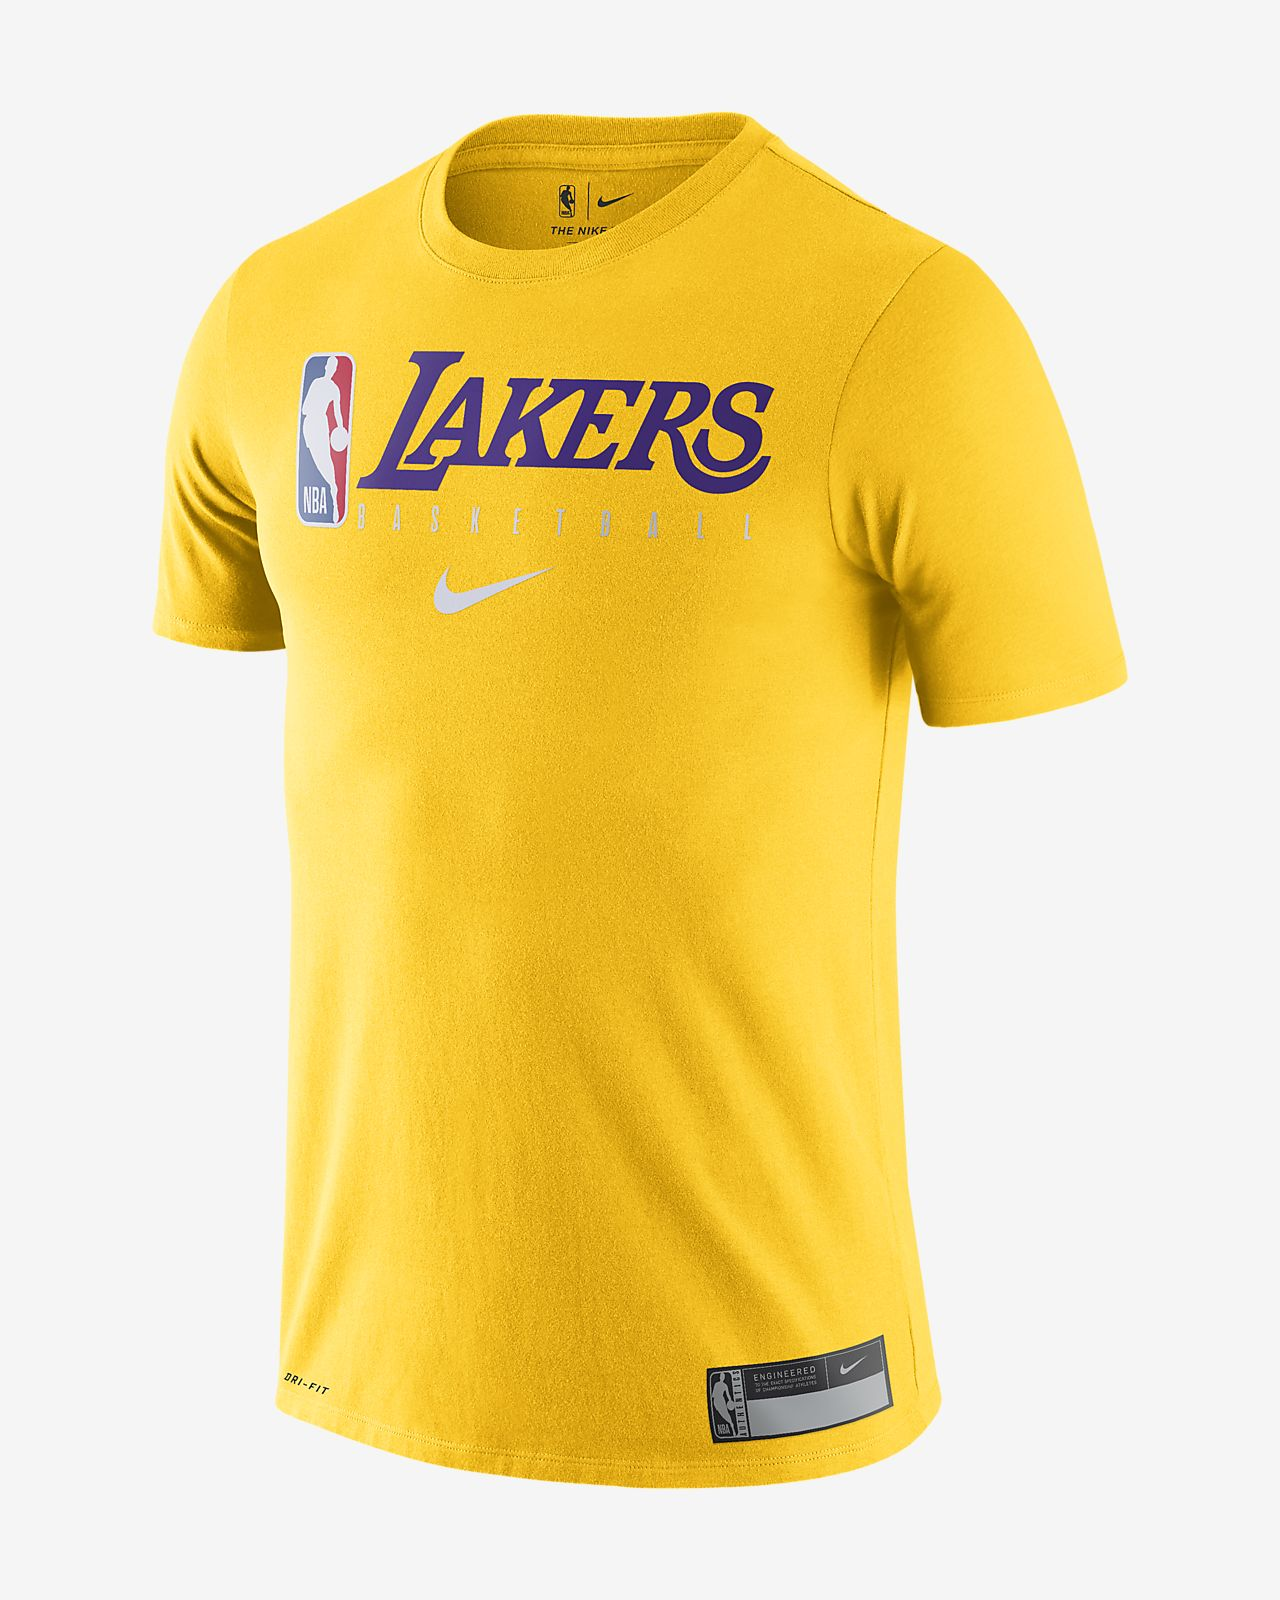 Playera de la NBA para hombre Los Angeles Lakers Nike